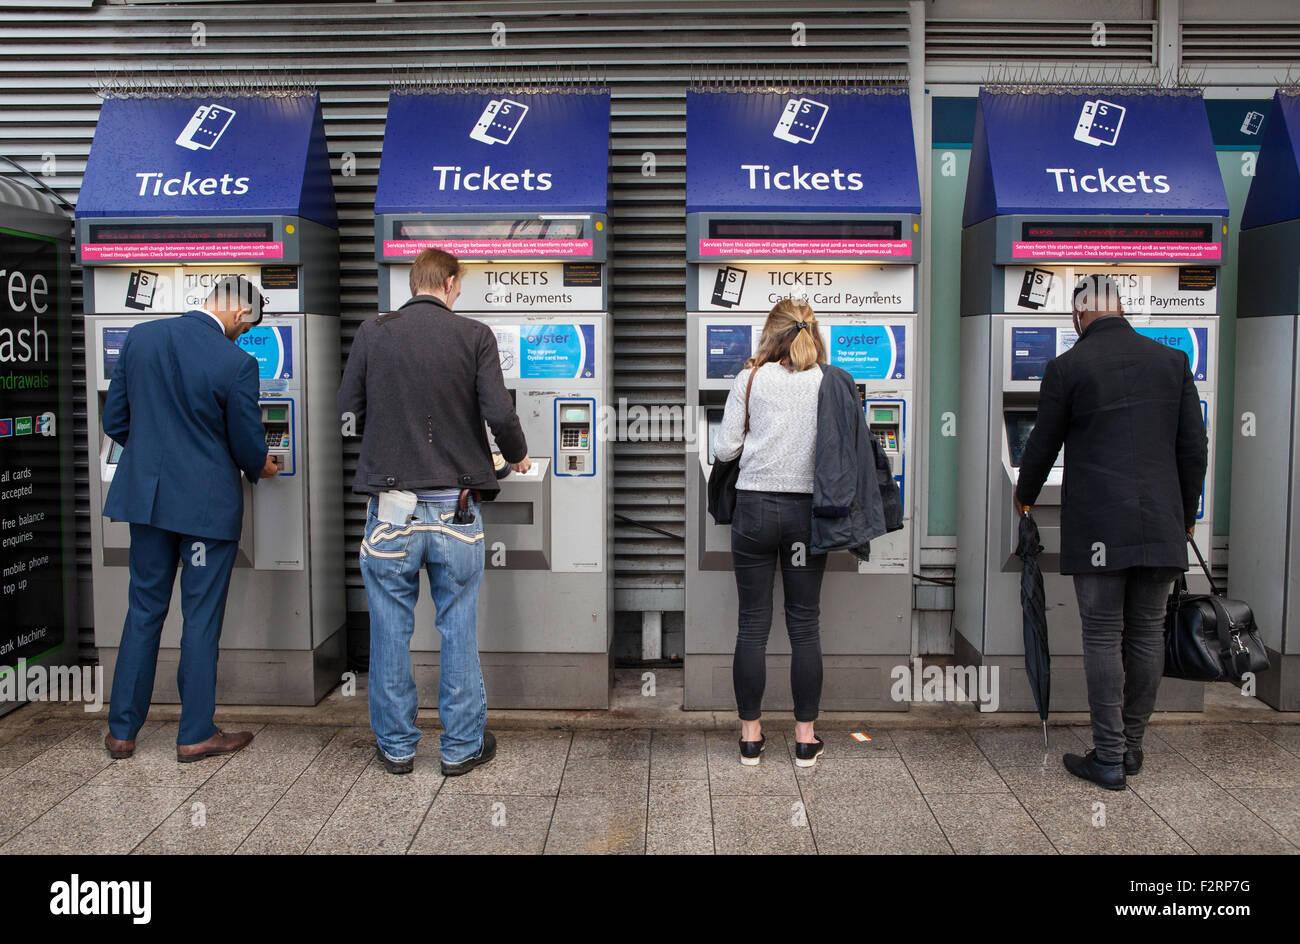 Rail passengers use self-service ticket machines at London Bridge train station - Stock Image